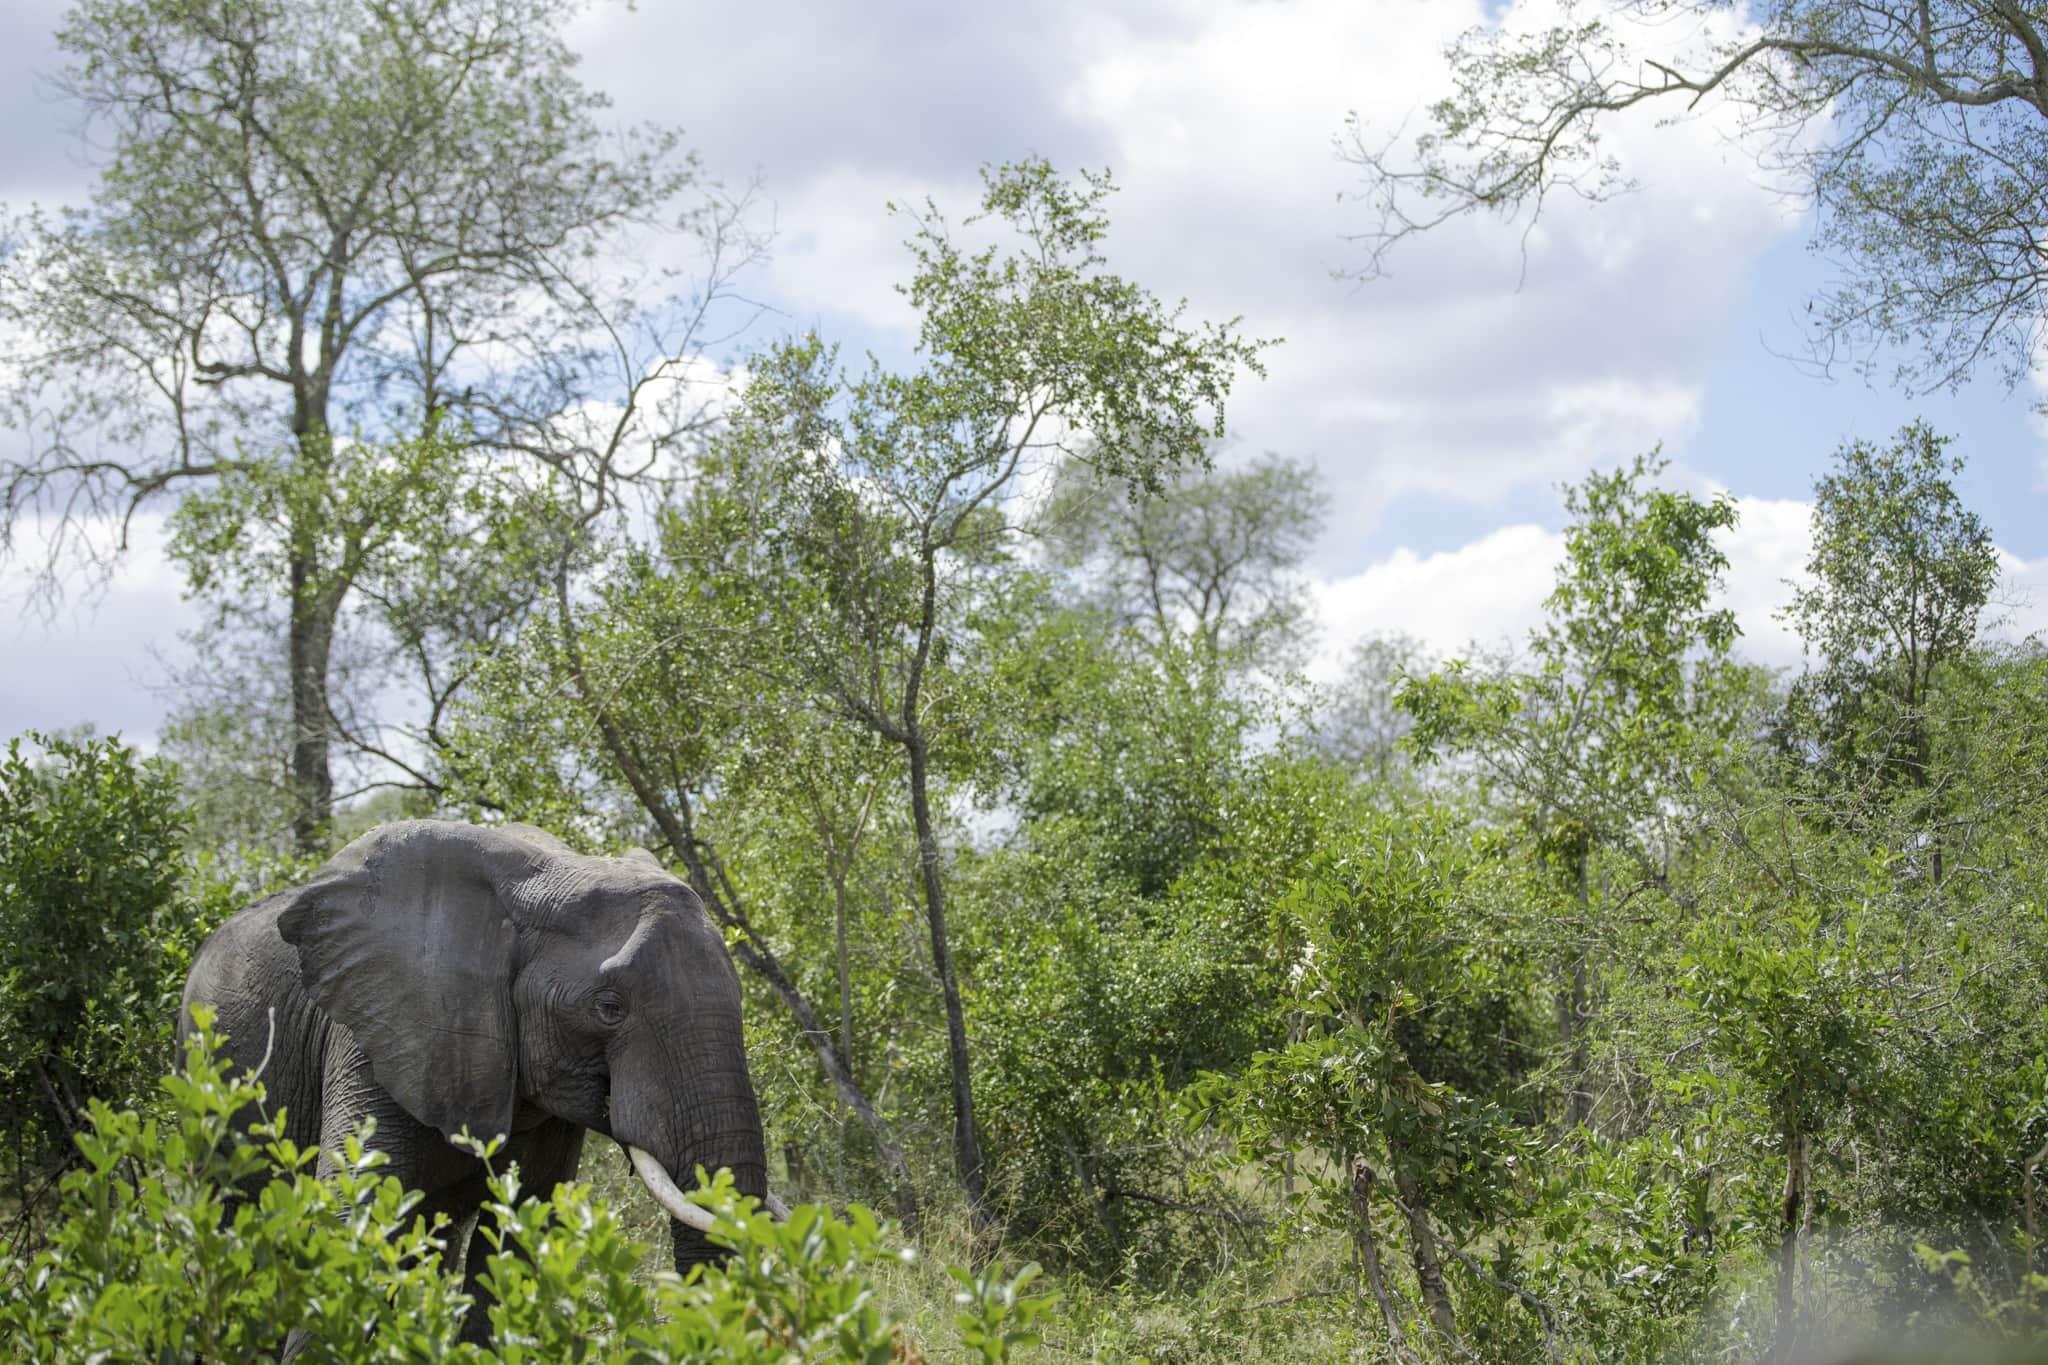 elephant grazing botswana